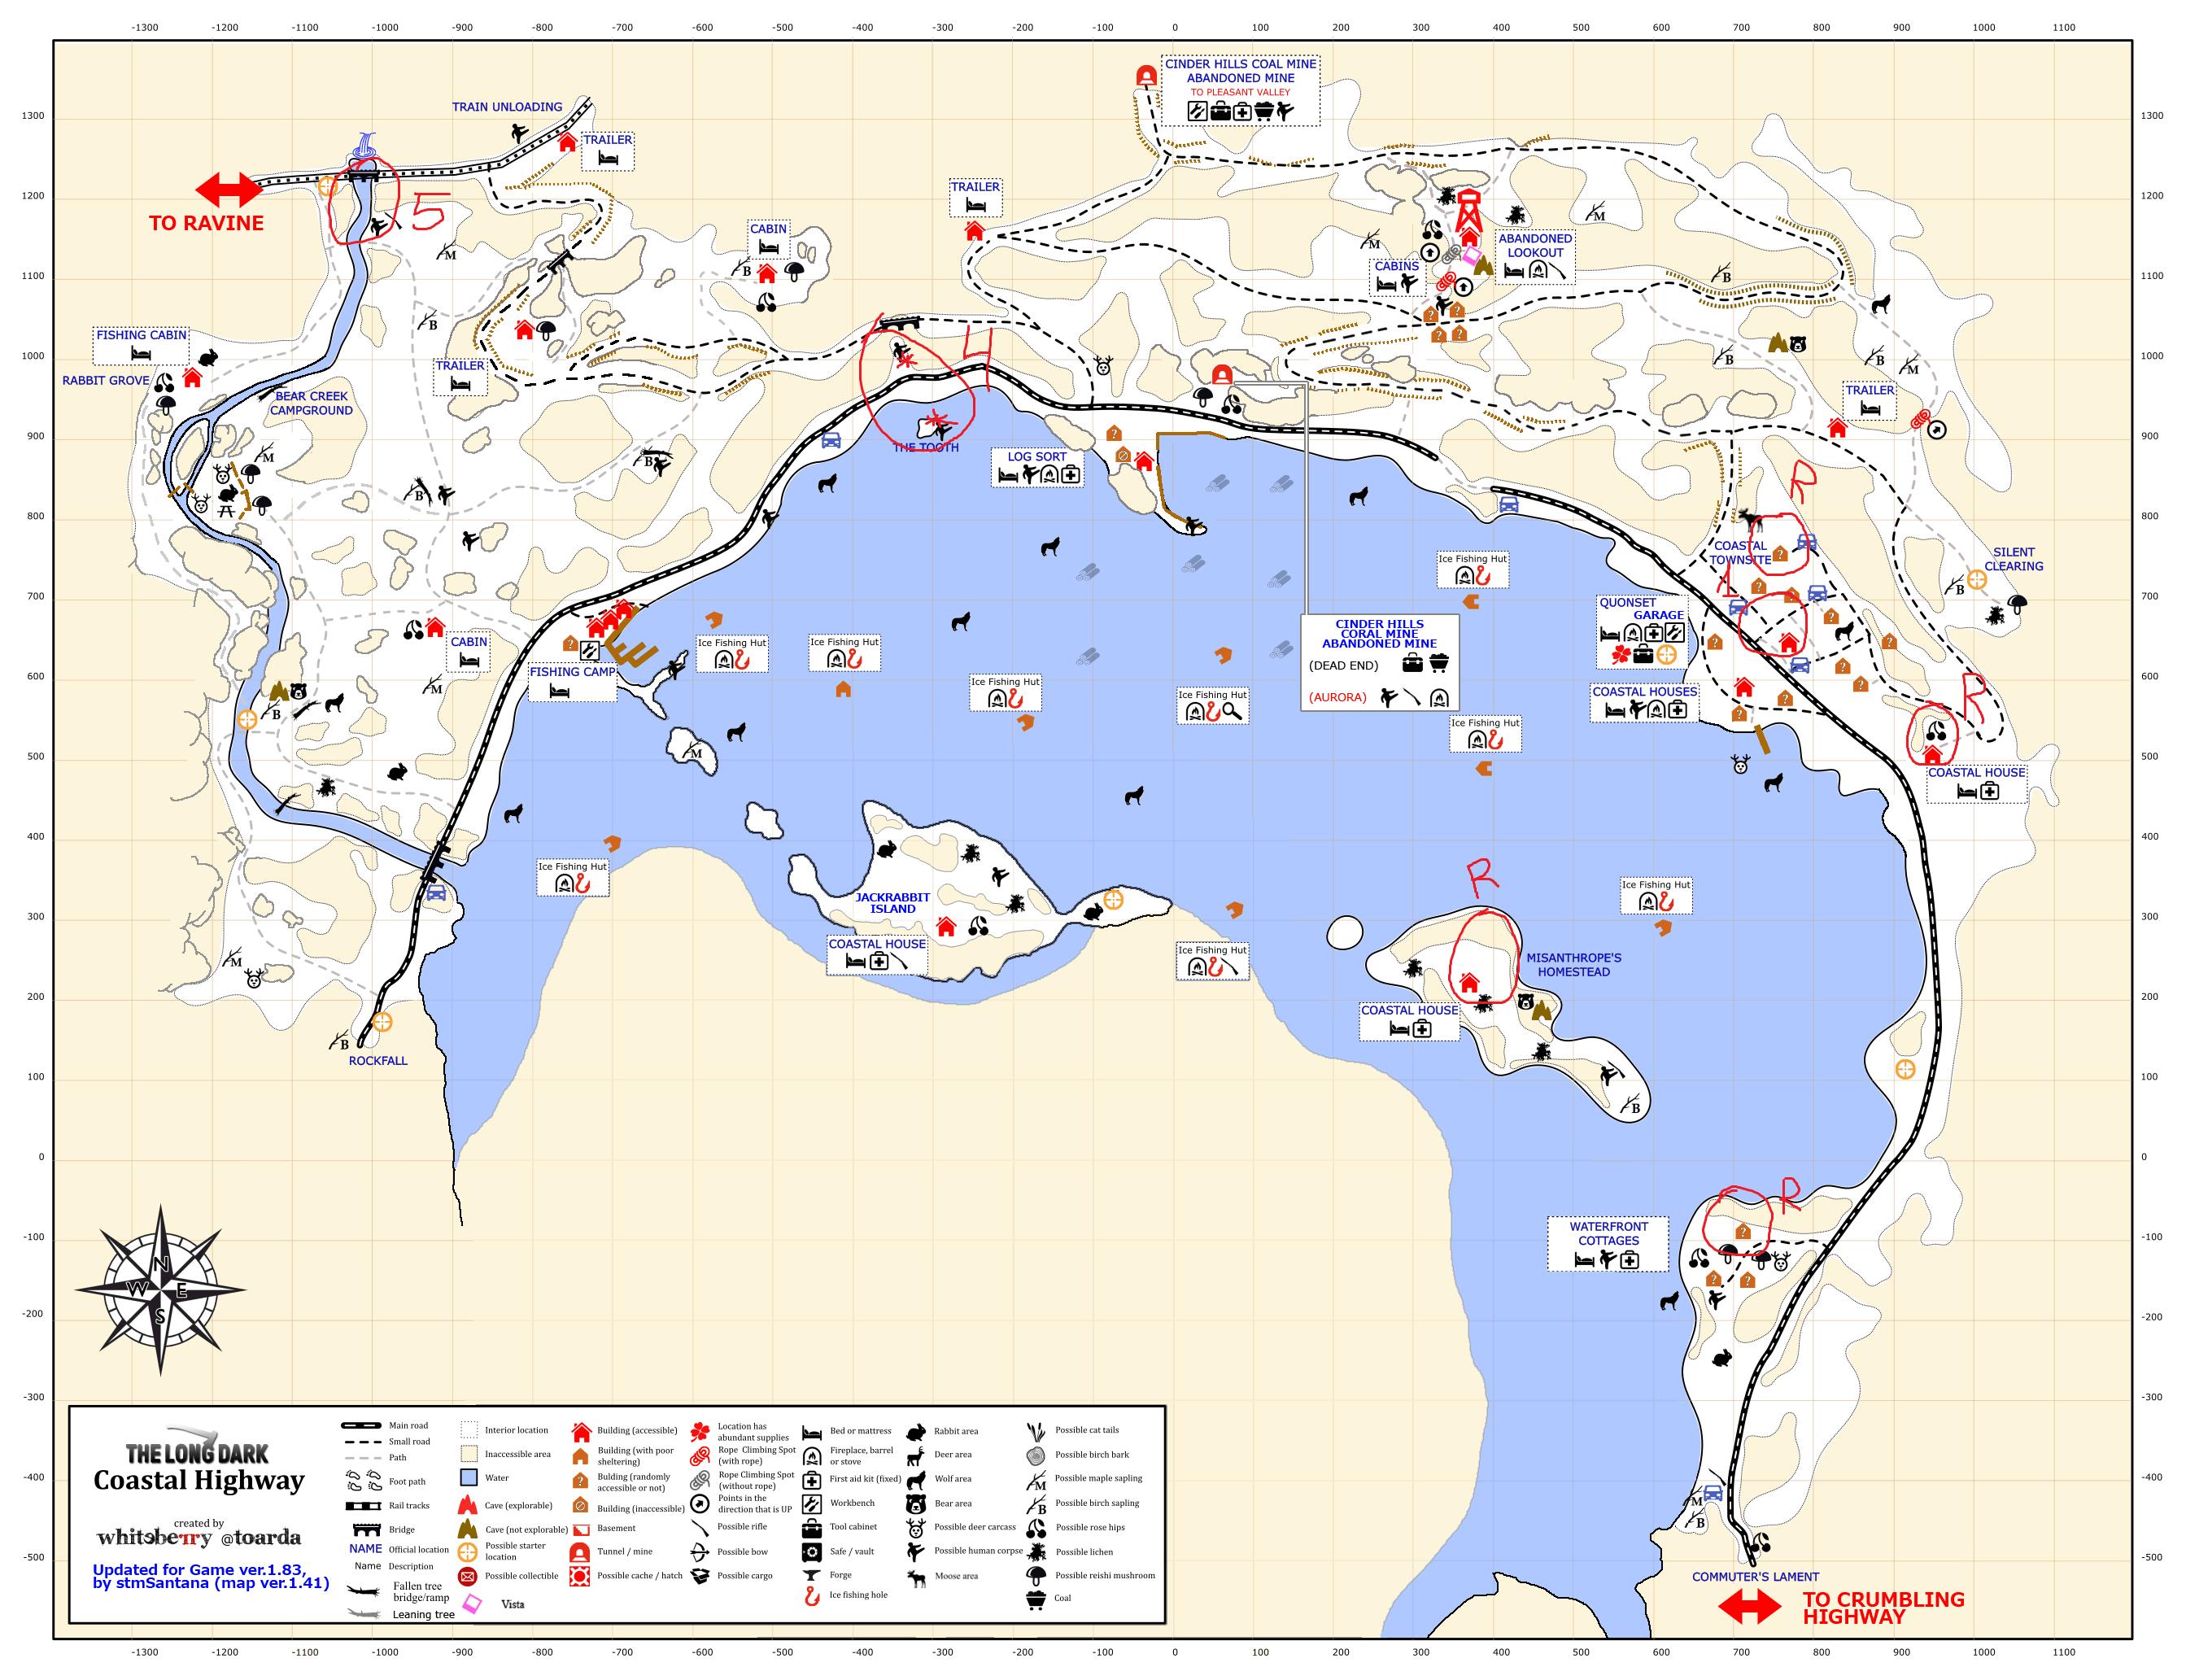 The Long Dark - Advanced rock cache placing + Top 5 caches per region - 9- Coastal Highway - F9BDC23